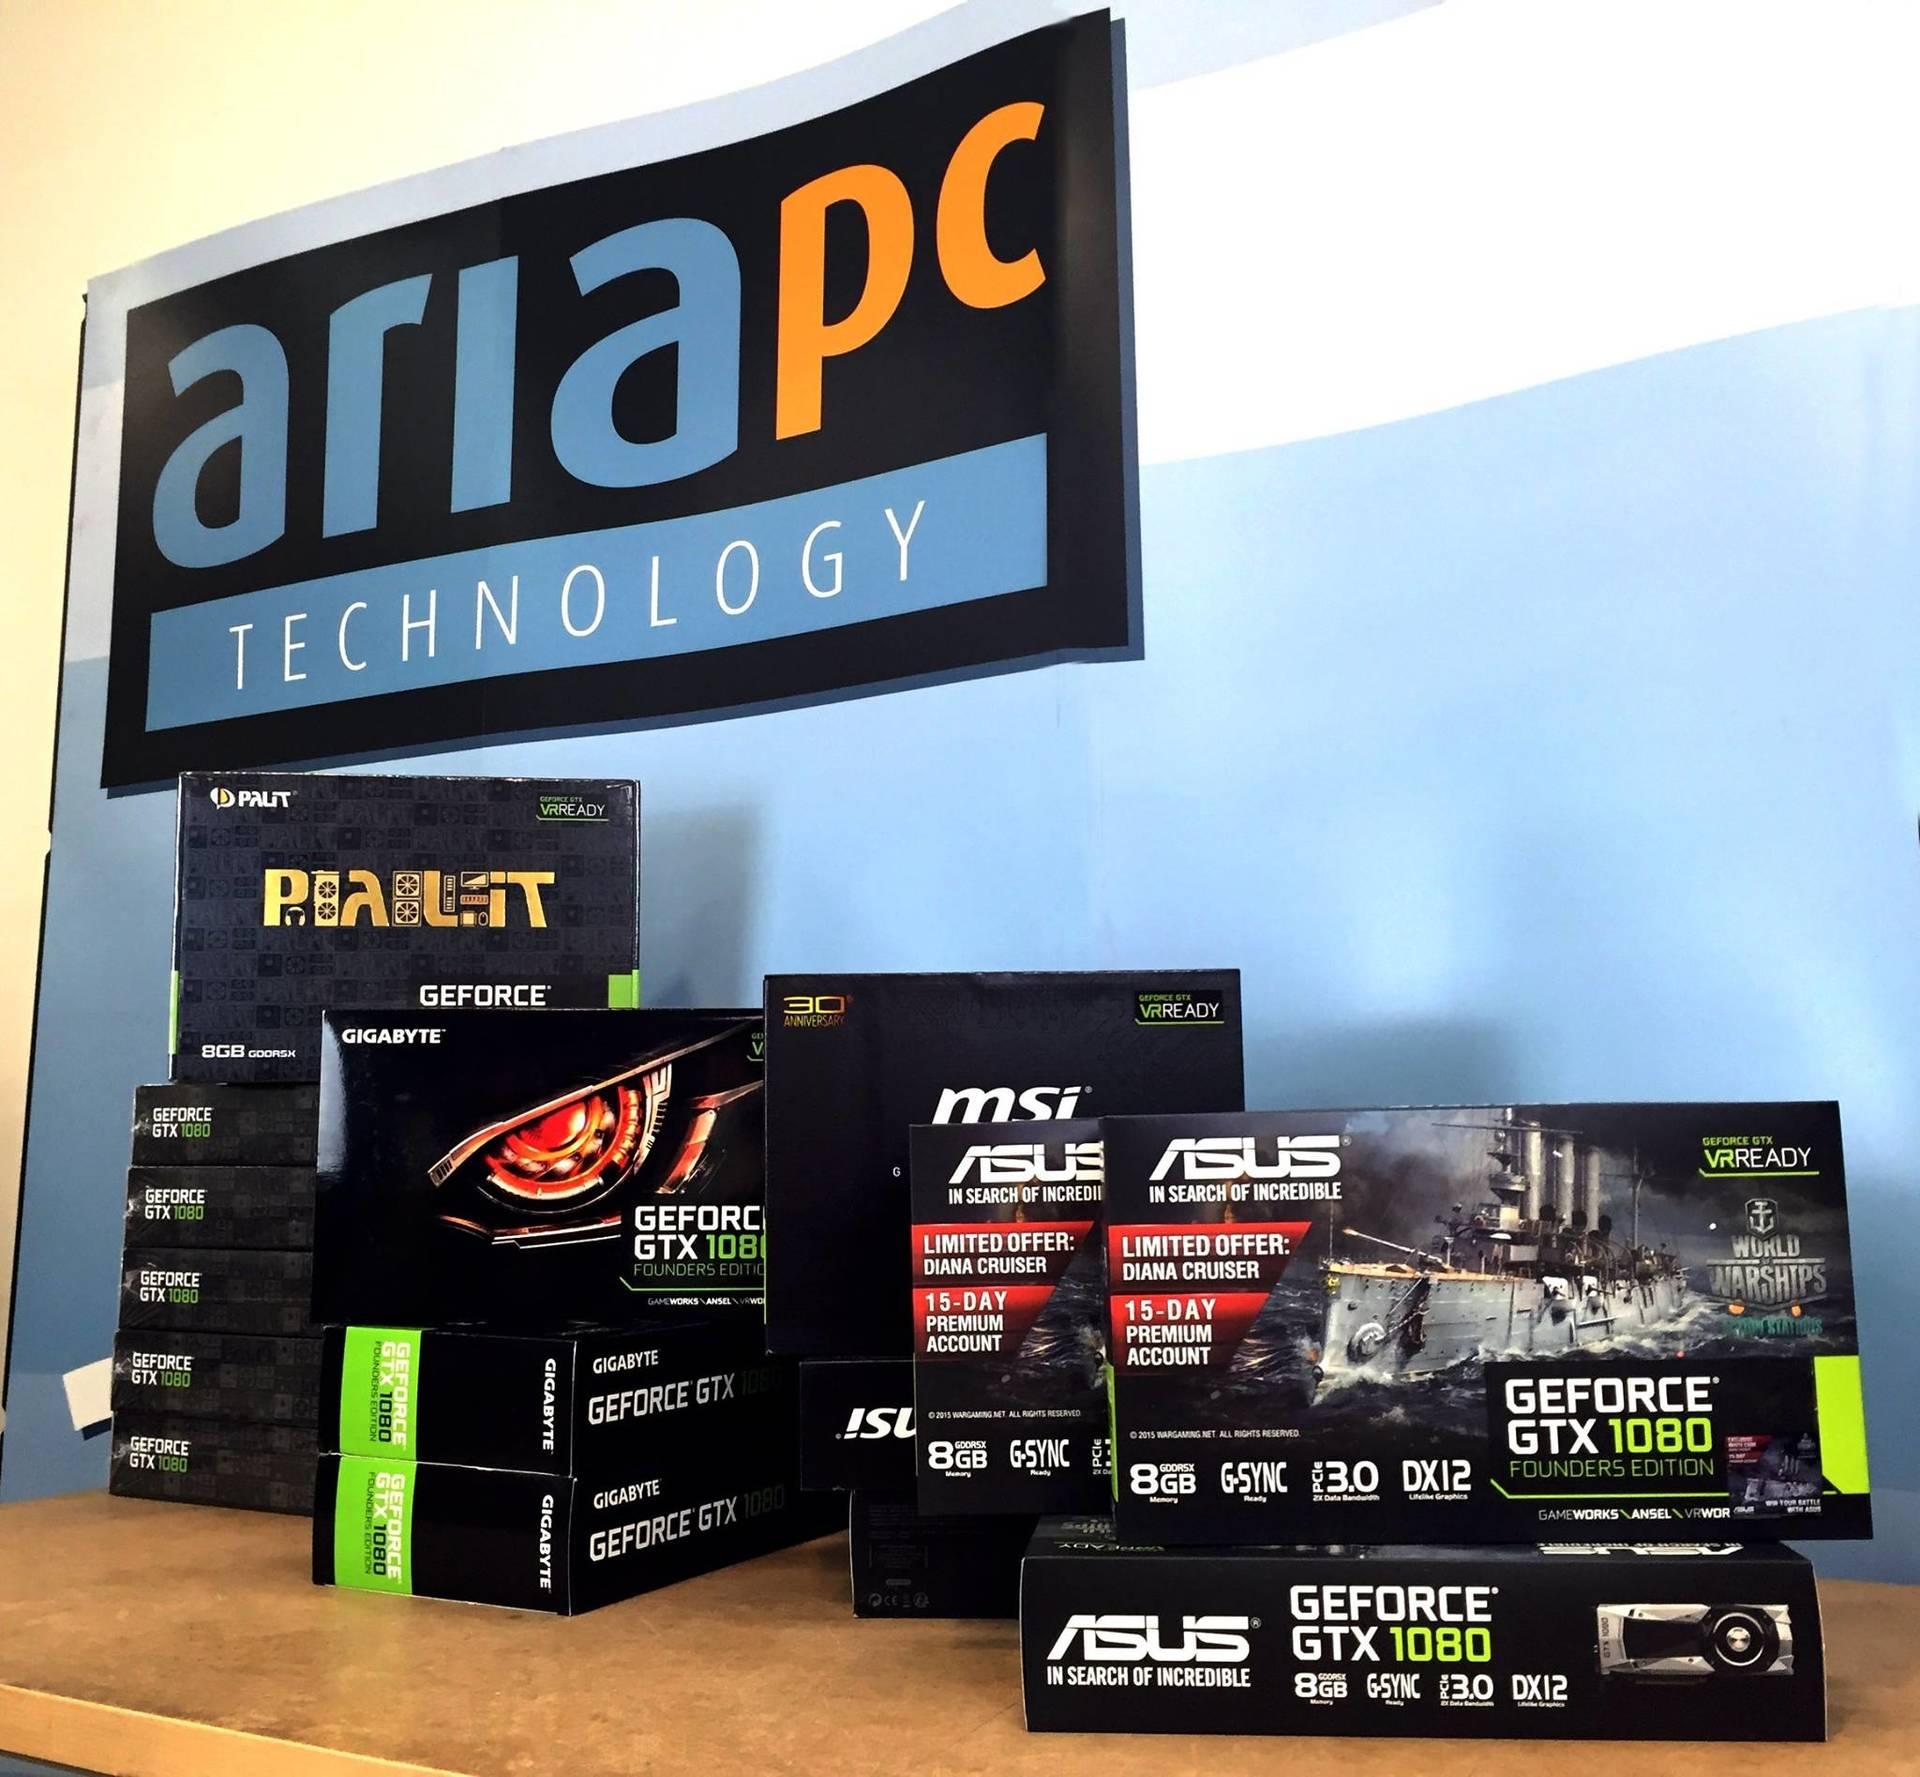 Aria Technology